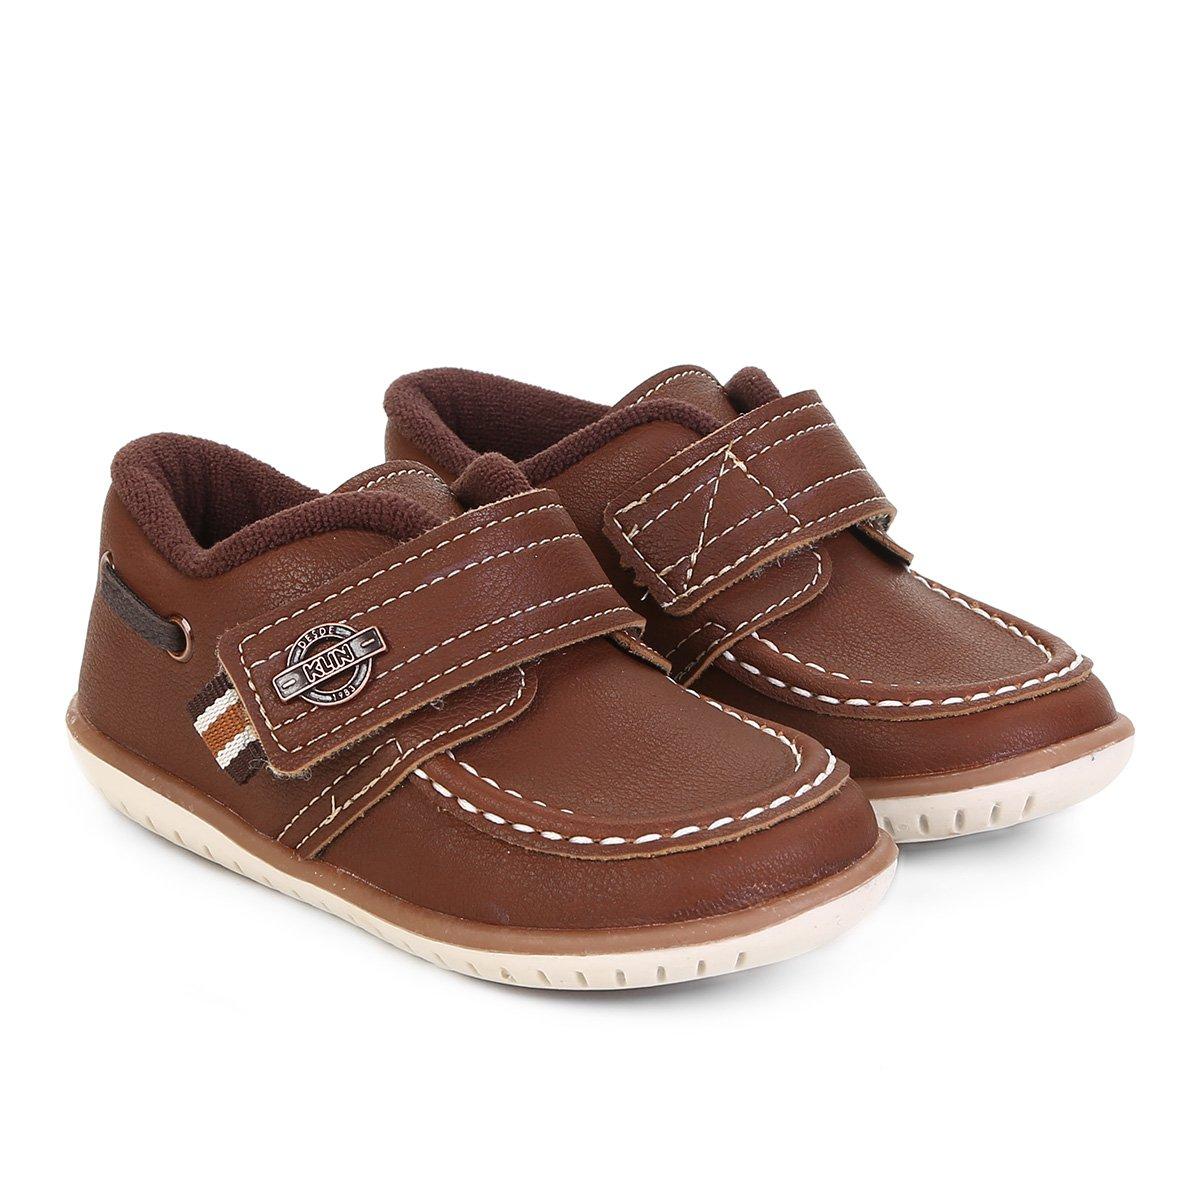 a345f165f Sapato Infantil Klin Cravinho Masculino